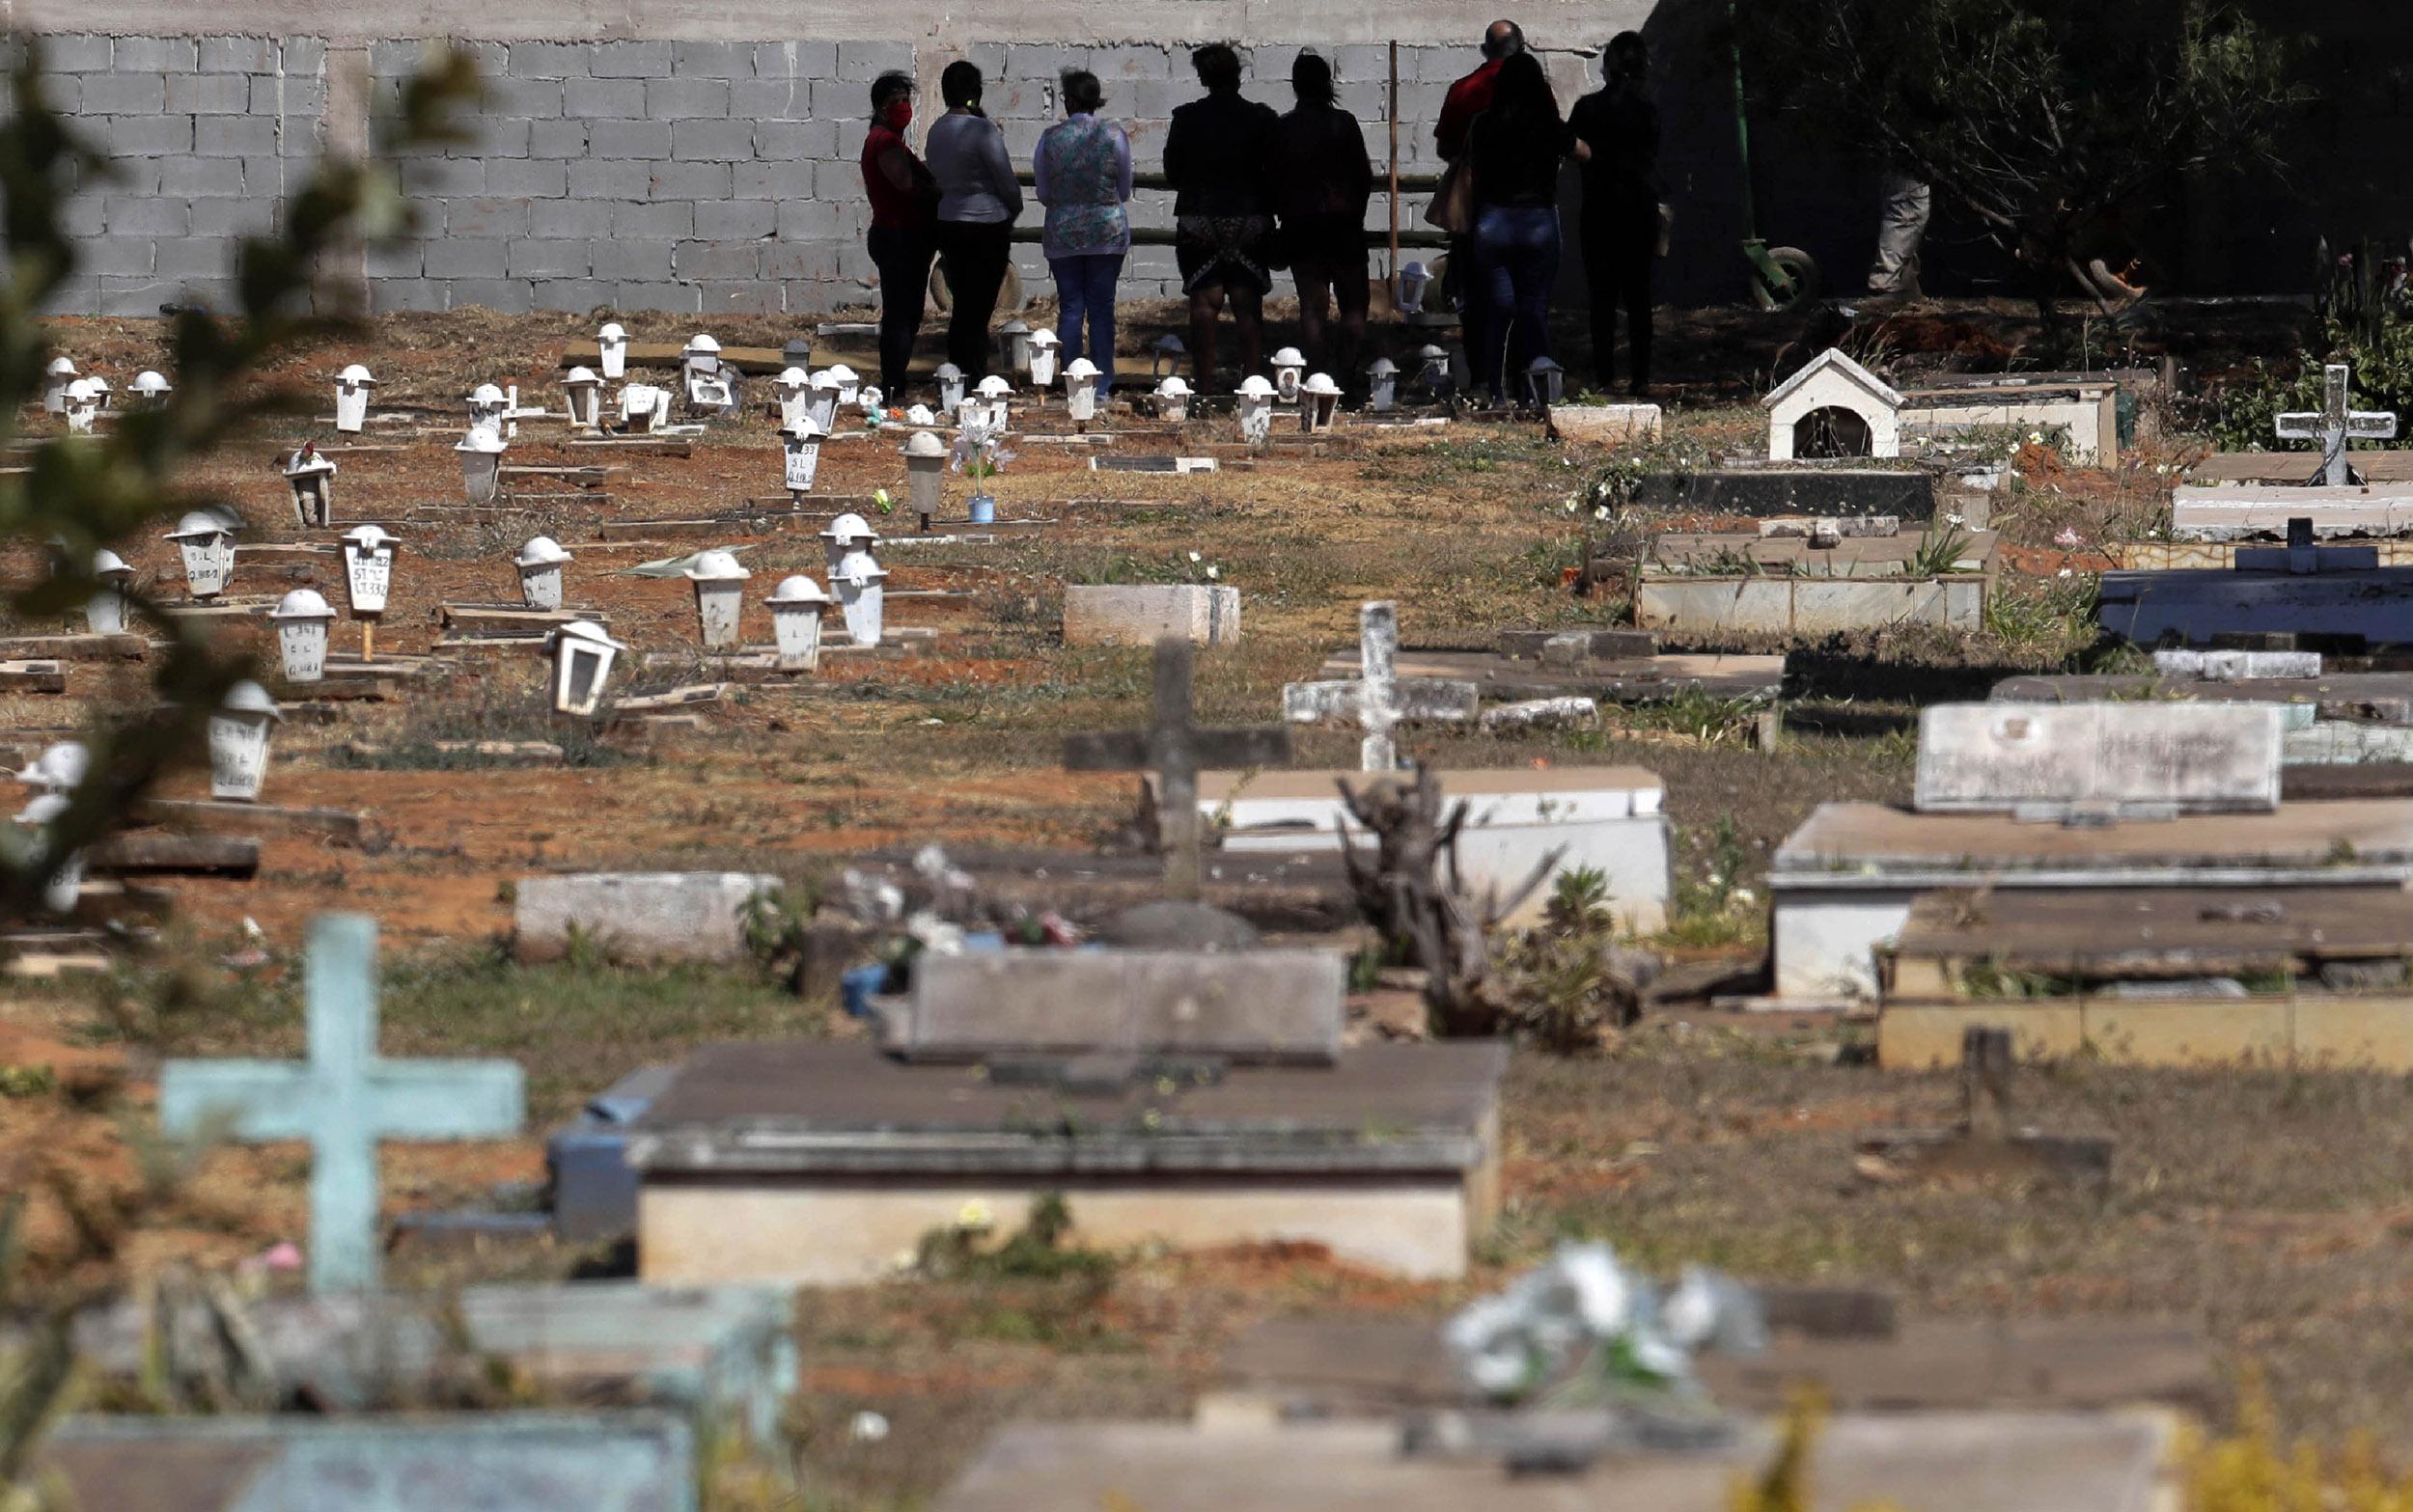 People attend the burial of Jose Mario de Souza Veiga, 83, whose family said died of COVID-19, at the Campo da Esperanca cemetery in Brasilia, Brazil, on Tuesday, July 21.